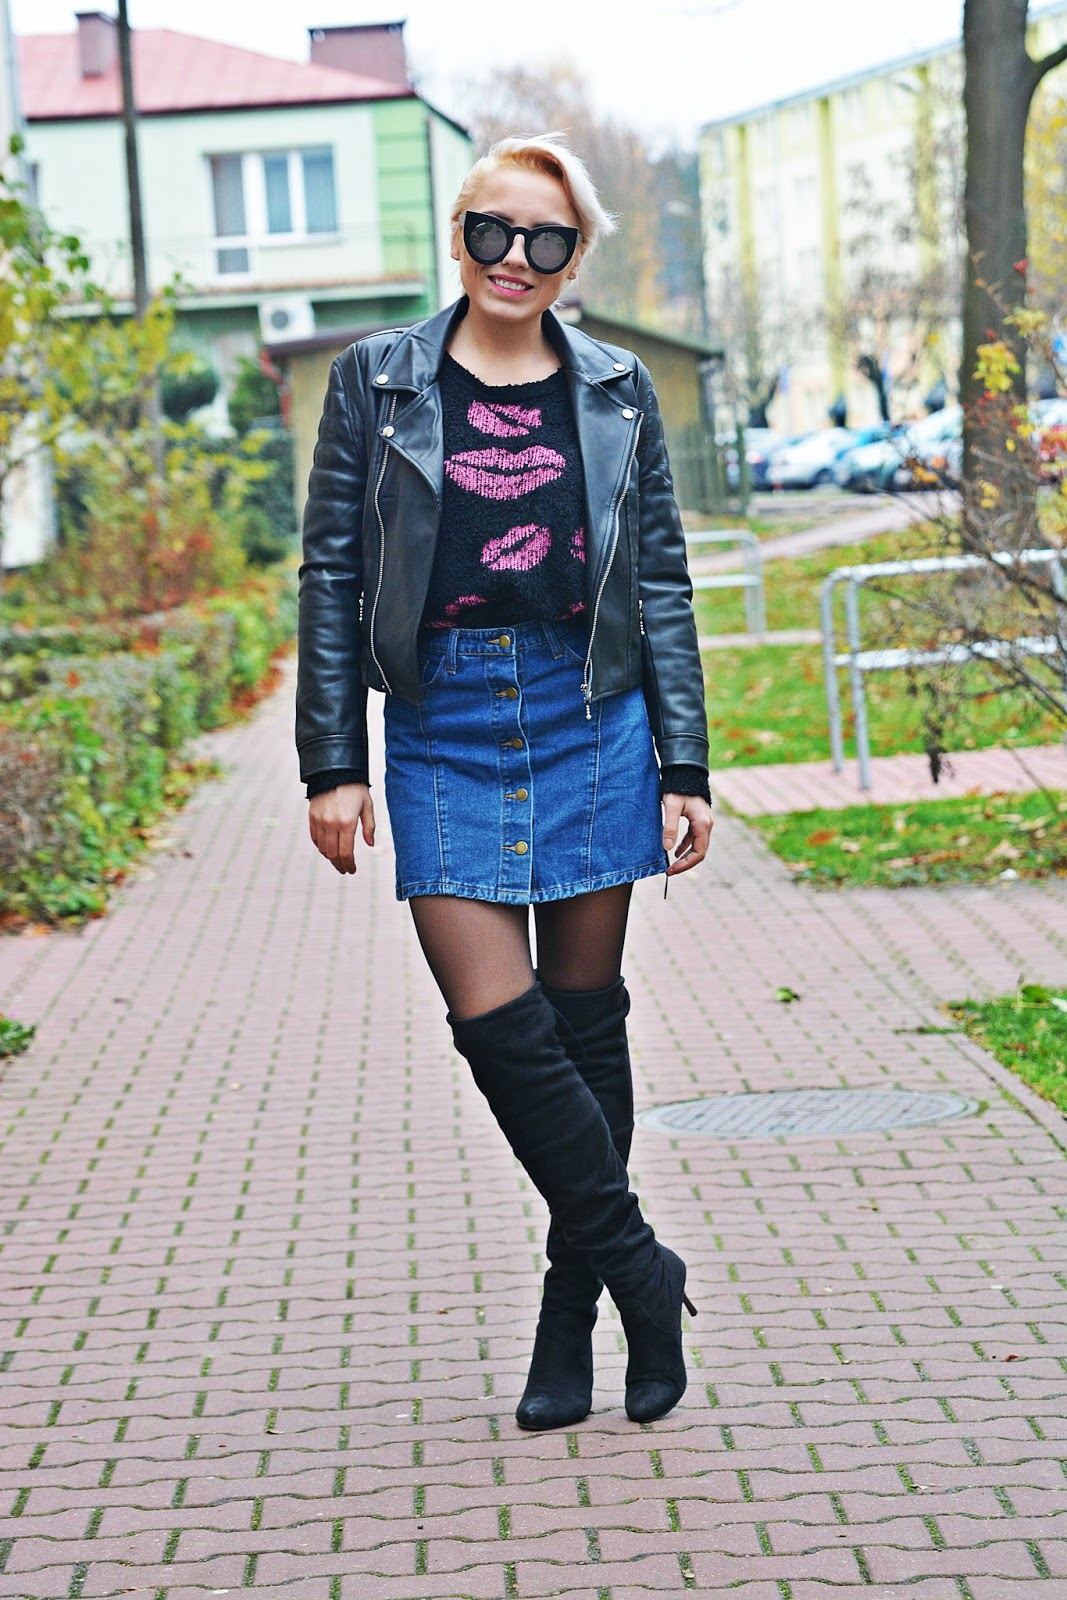 jeansowa_spodnica_skorzana_ramoneska_buty_za_kolano_karyn7